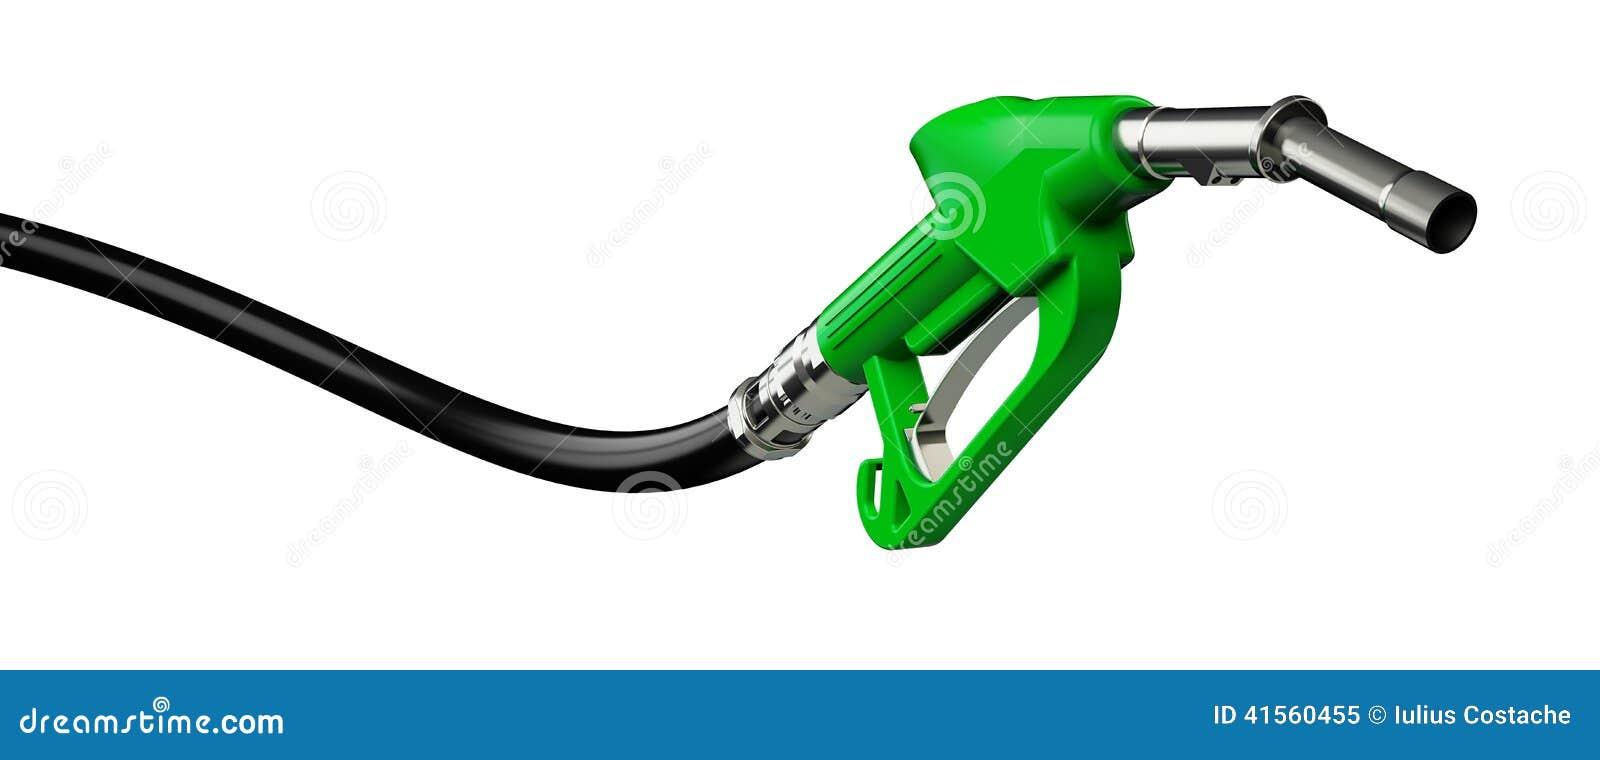 fuel pump nozzle stock illustration image 41560455